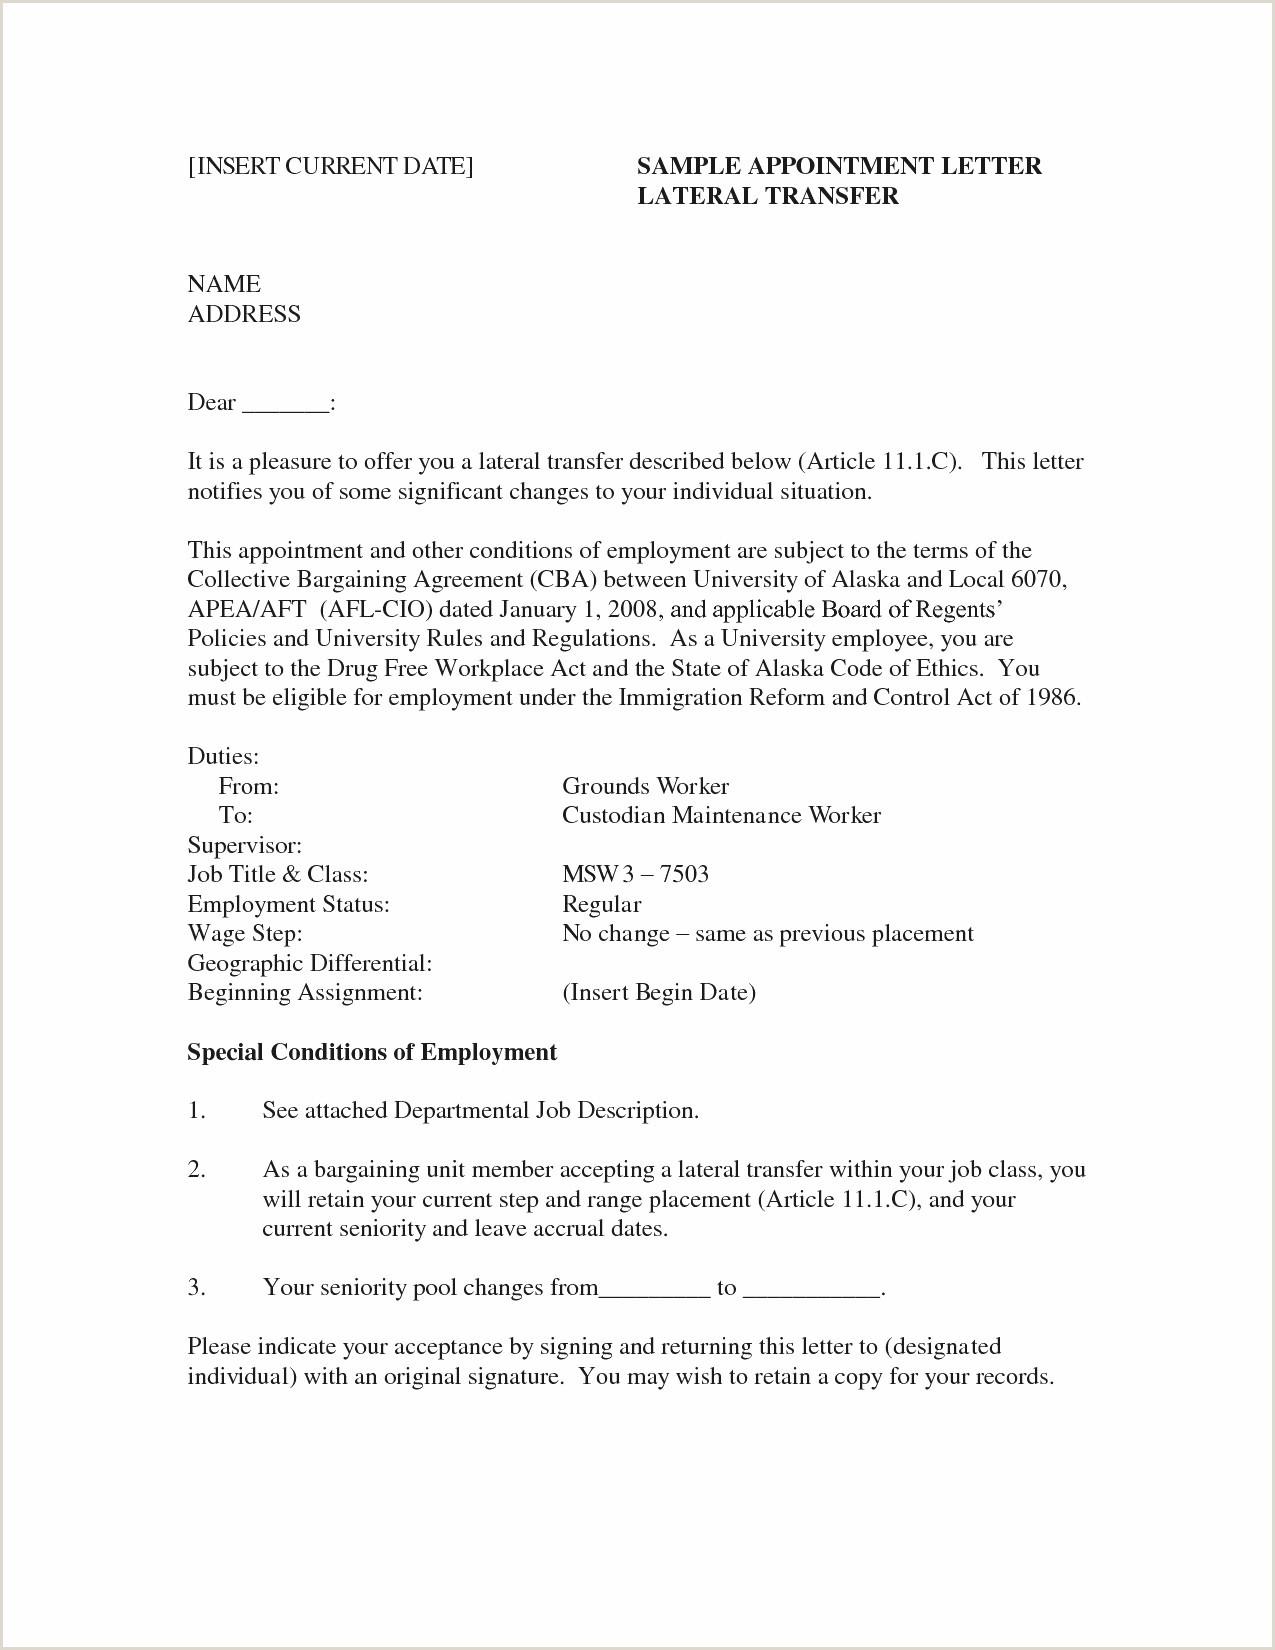 maotme life Document Ideas